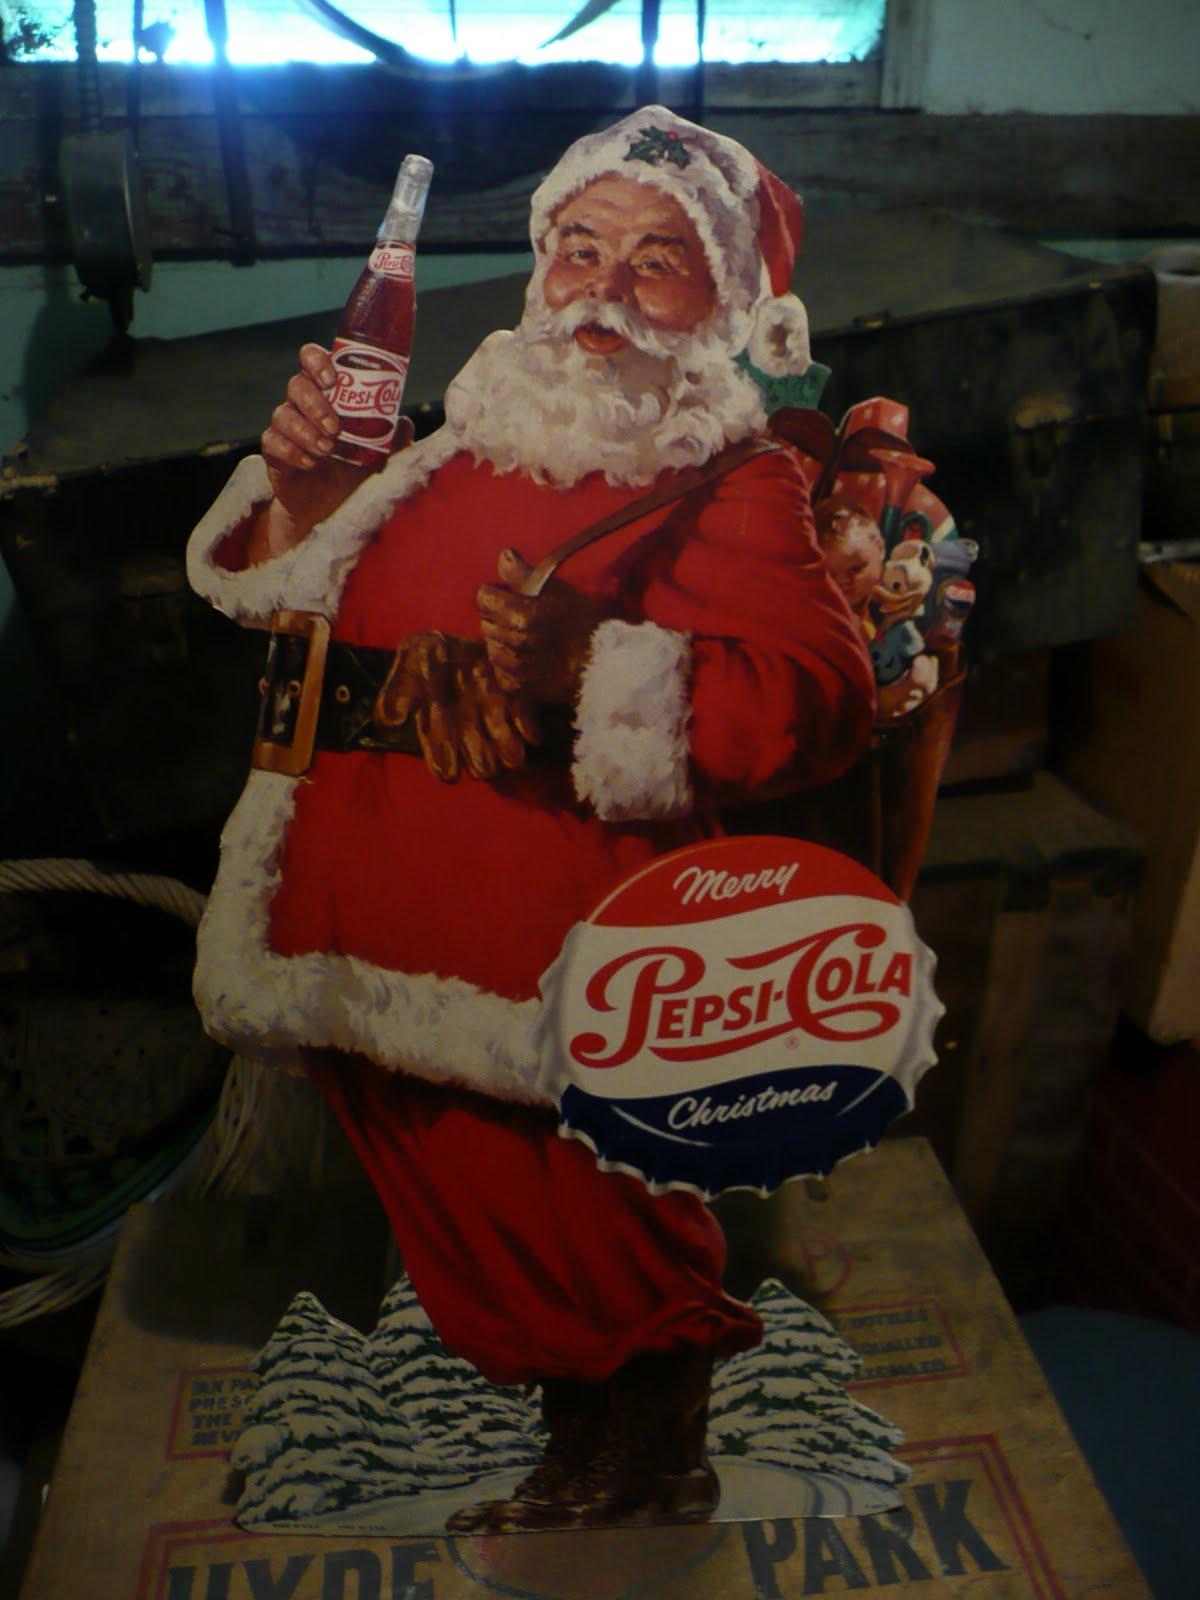 Pepsi-Cola Santa Claus display - date unknown